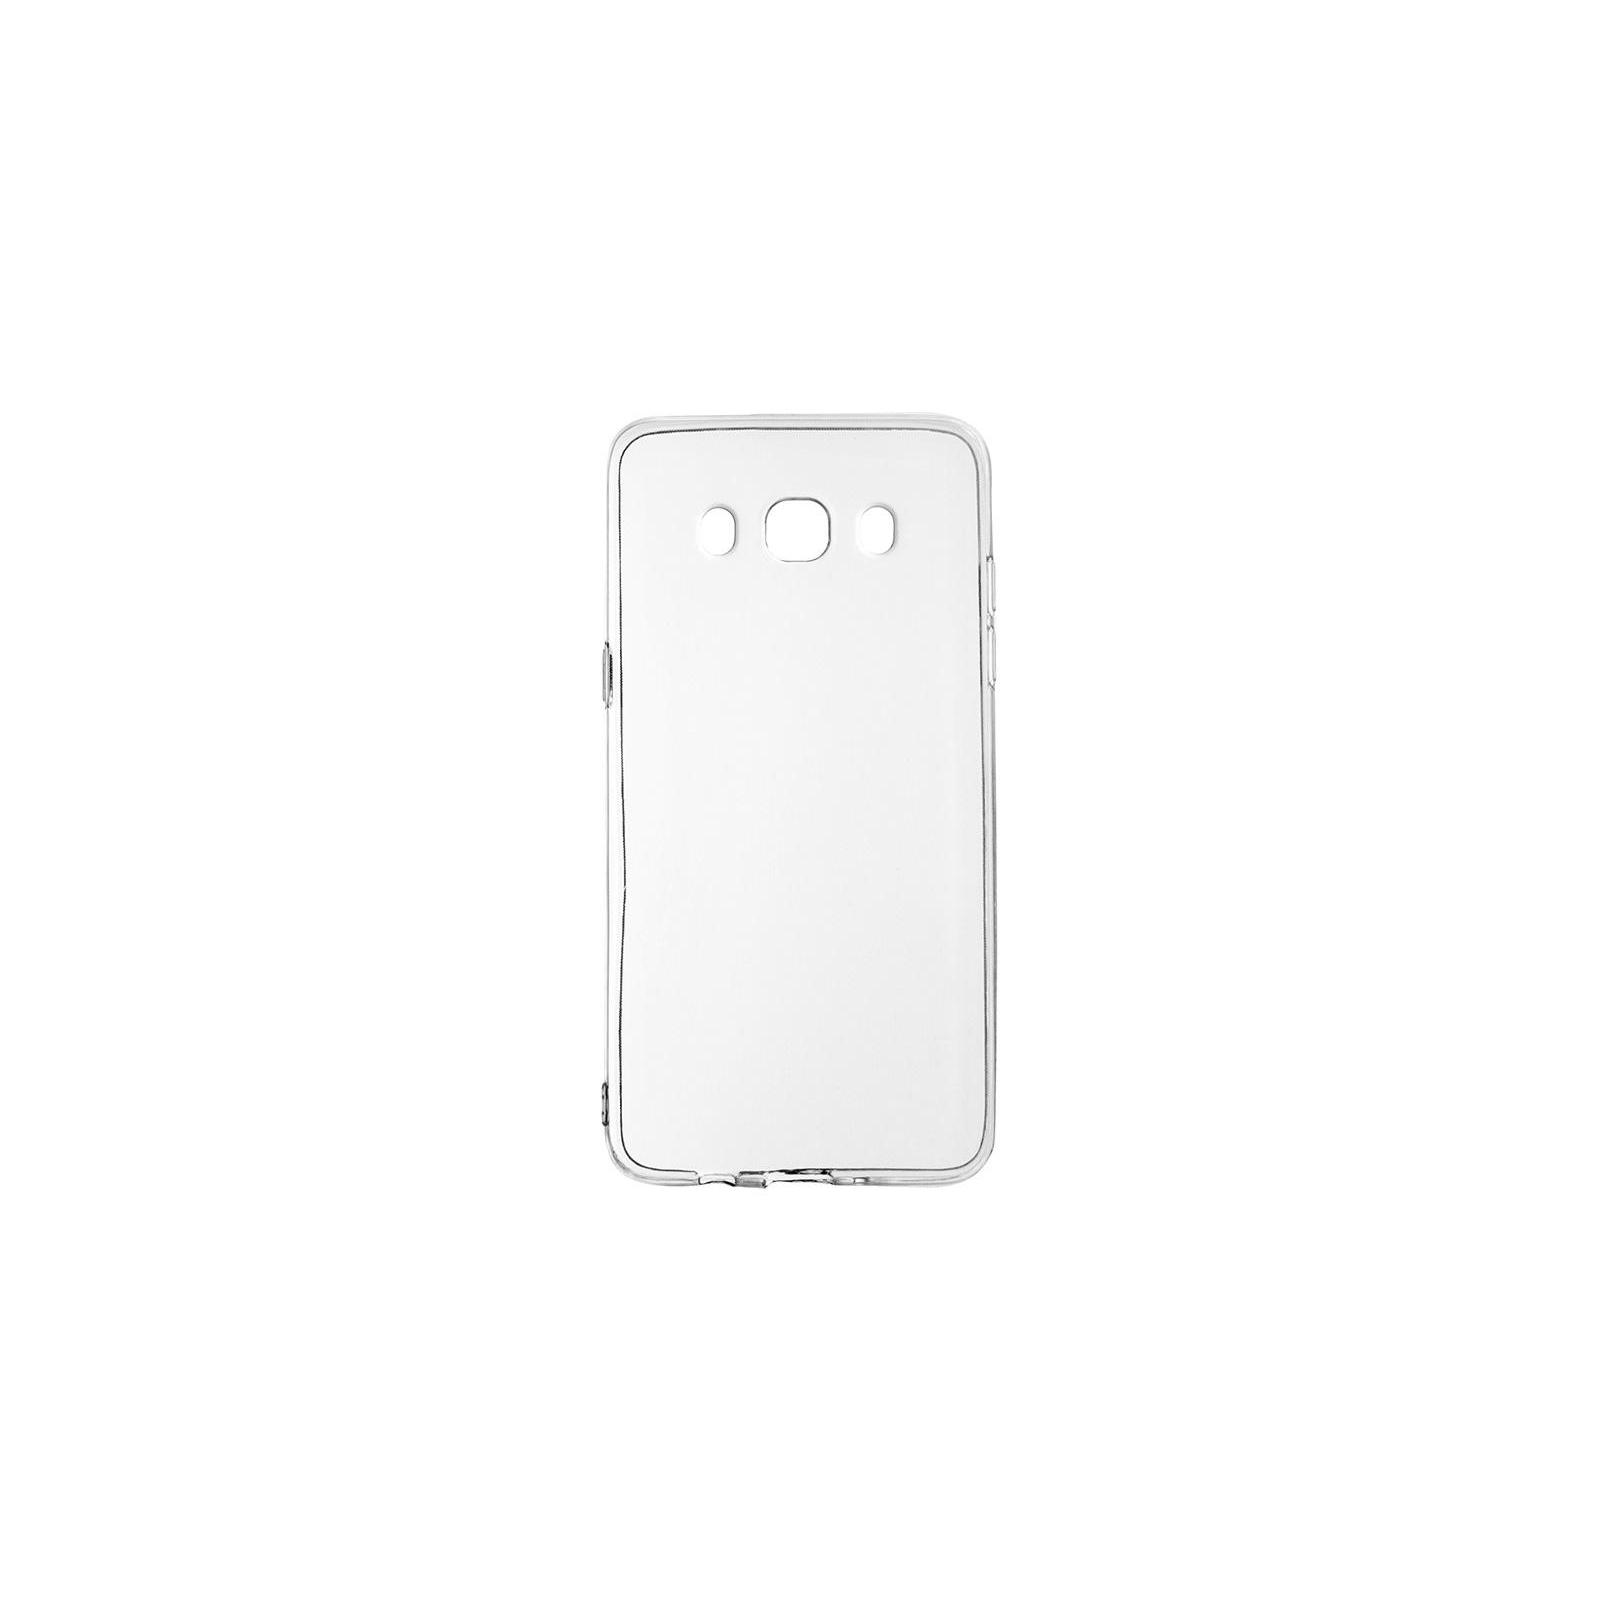 Чехол для моб. телефона Colorway ultrathin TPU case for Samsung Galaxy J5 (2016) SM-J510 (CW-CTPSJ510)